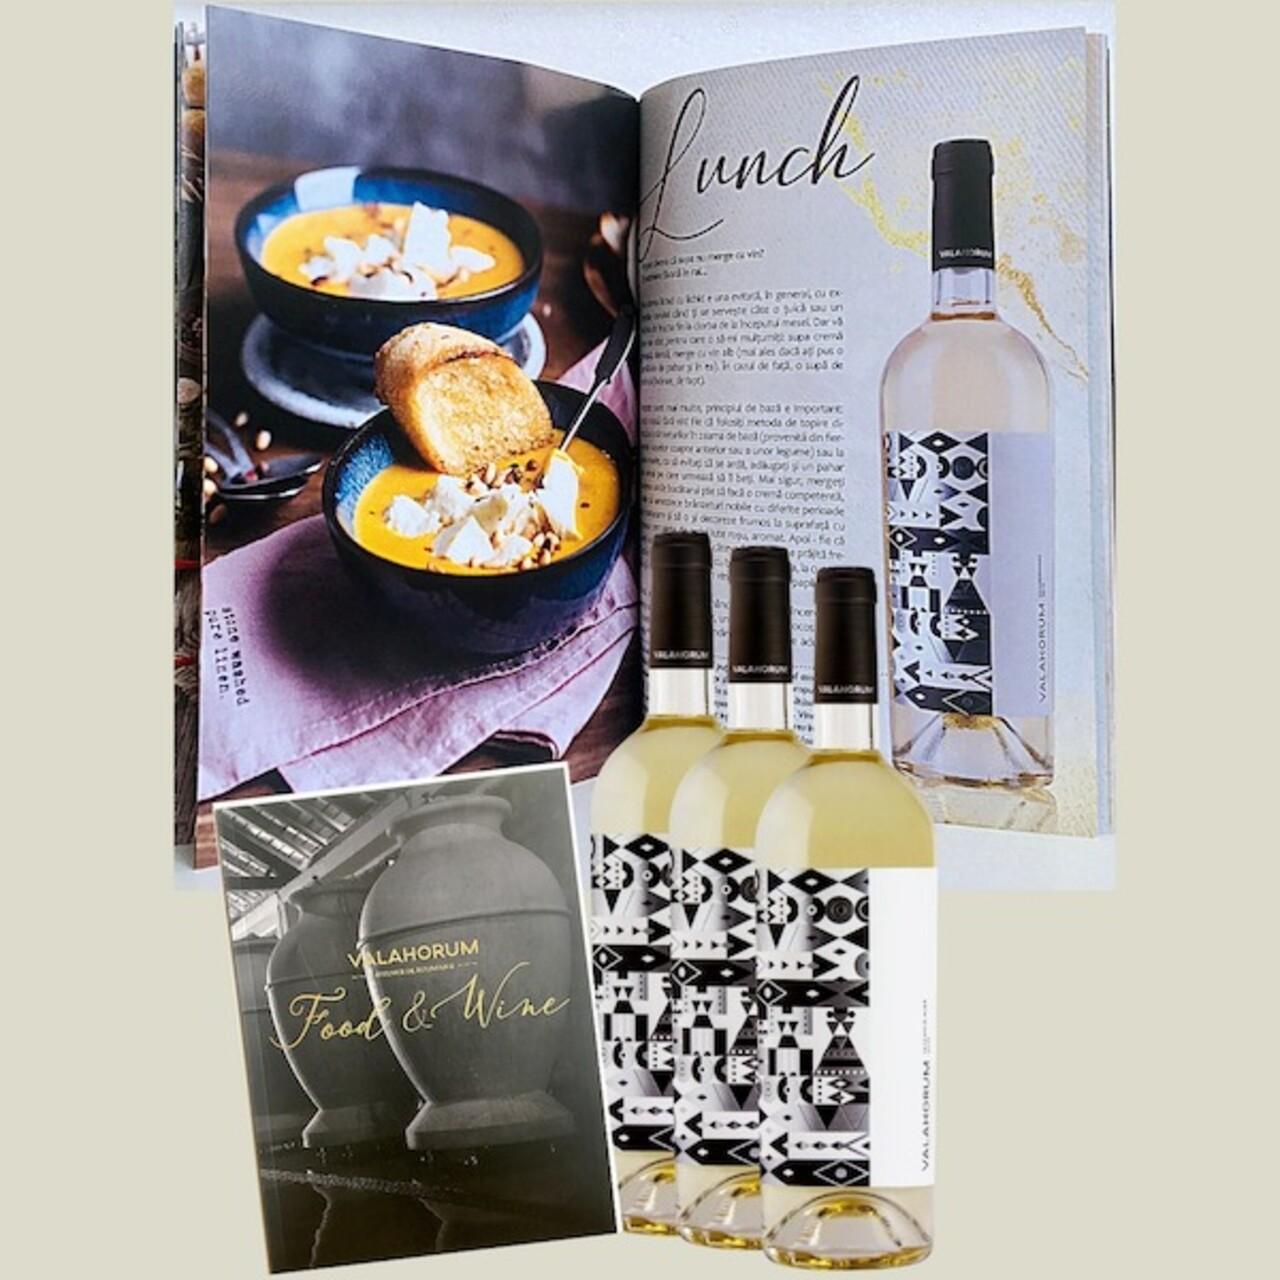 Pachet 3 st. Valahorum Alb Sauvignon Blanc + Catalog Food&Wine de asocieri